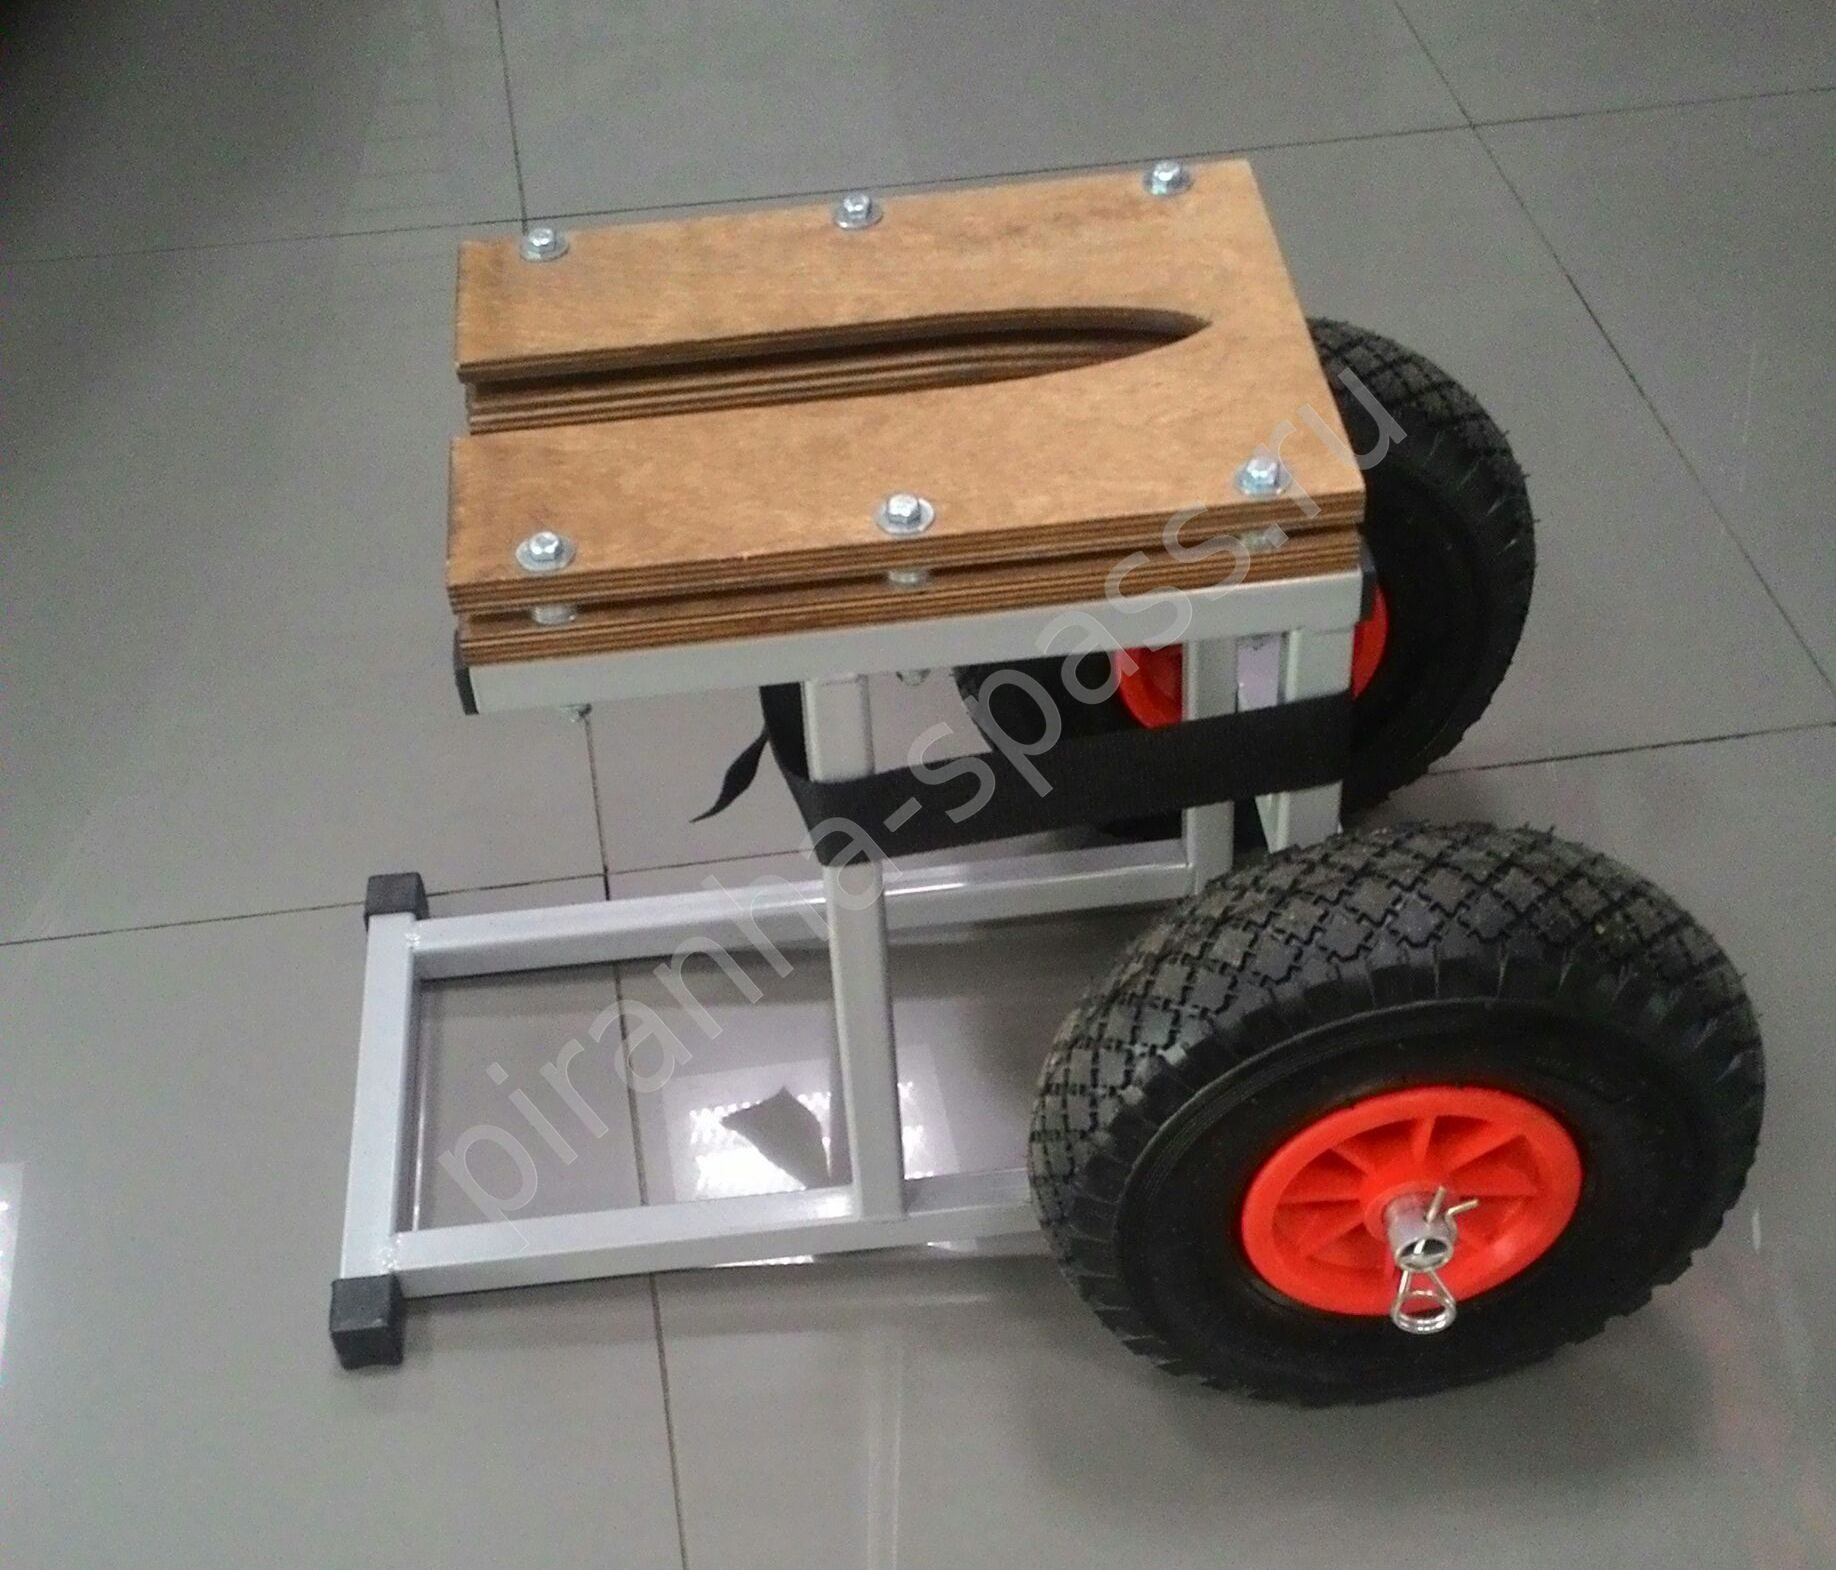 Тележка для лодочного мотора своими руками чертежи картинки